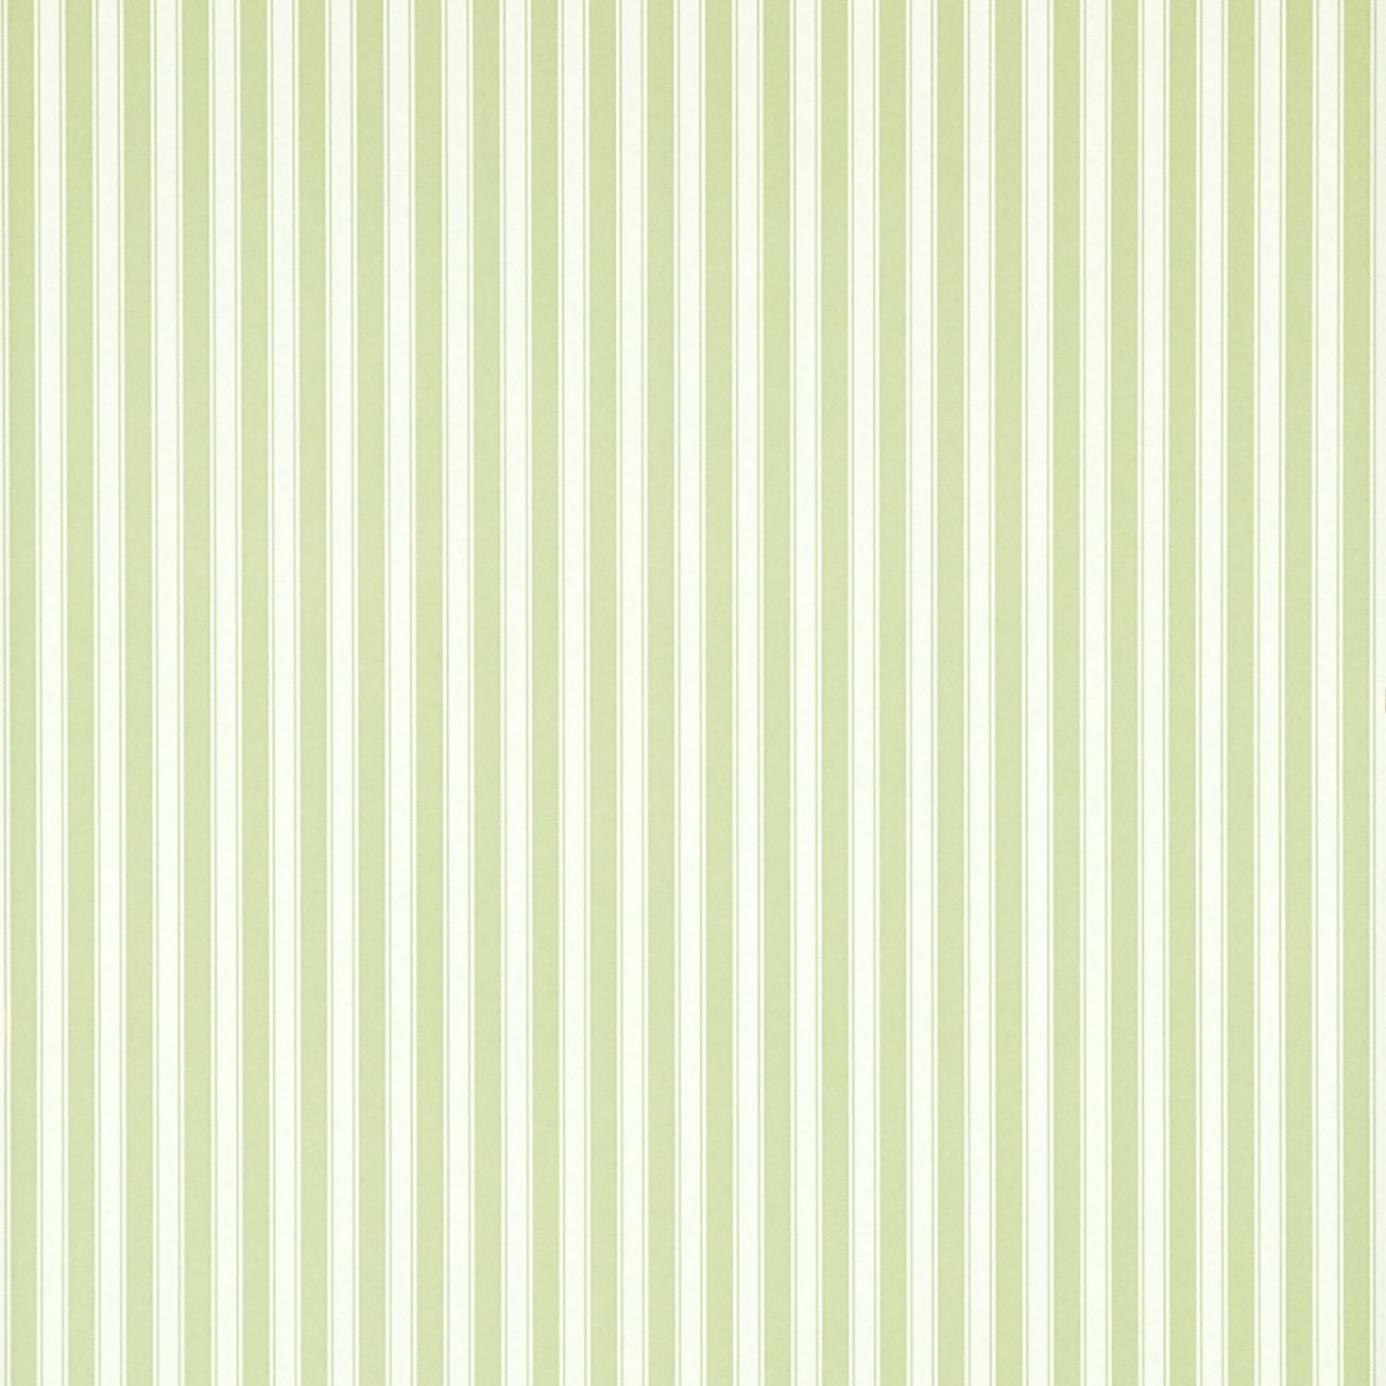 Free Download Wallpapers New Tiger Stripe Wallpaper Leaf